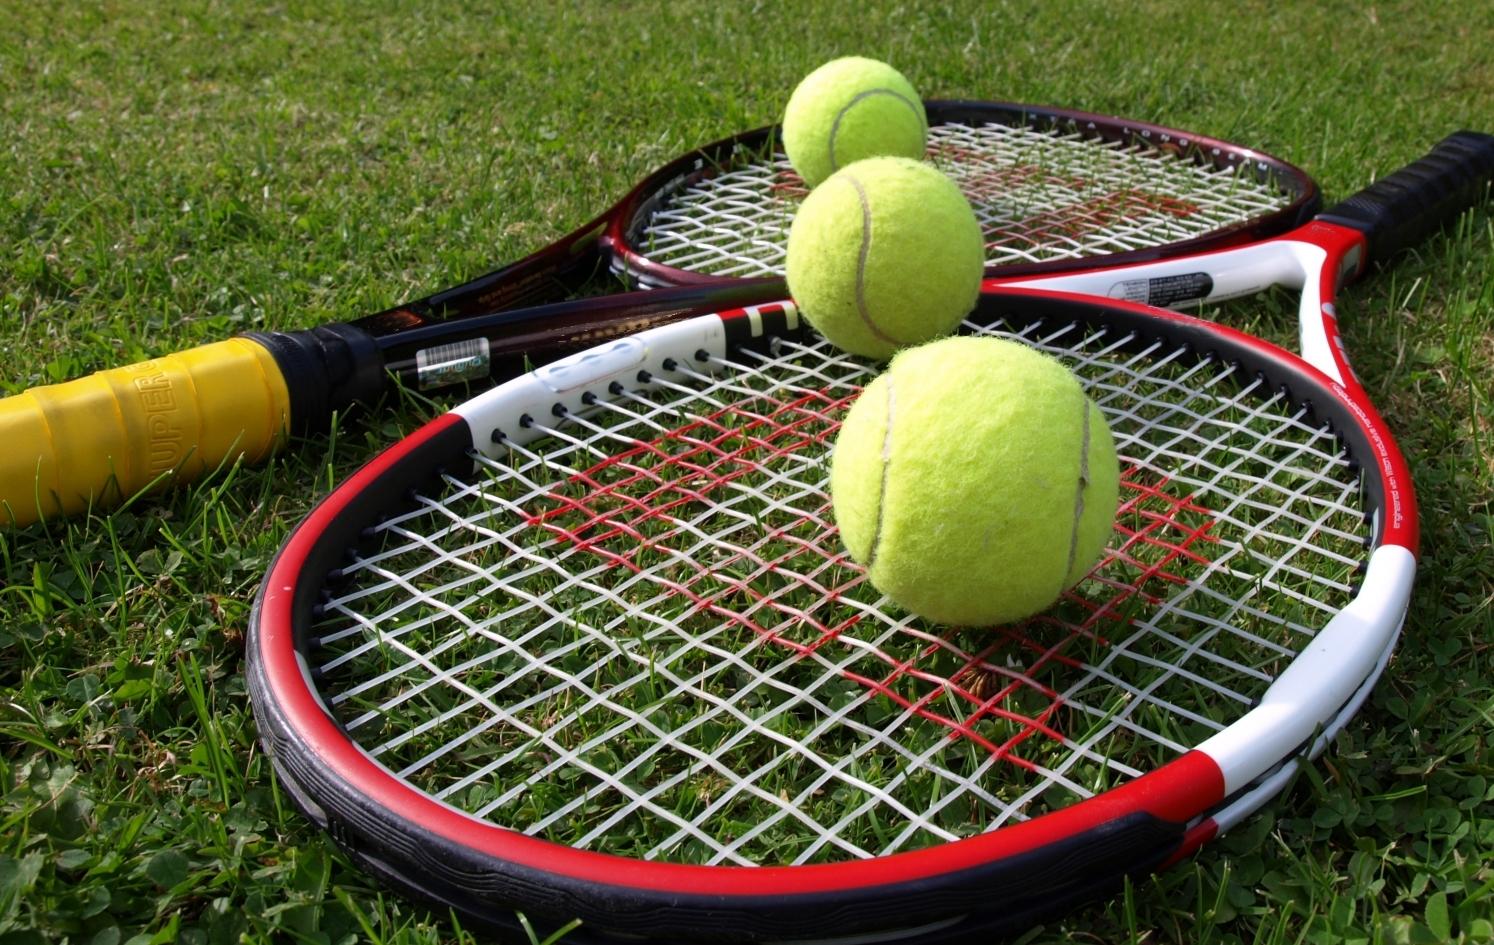 68a916c3bf3cccf90605_tennis-balls-and-rackets.2.jpg